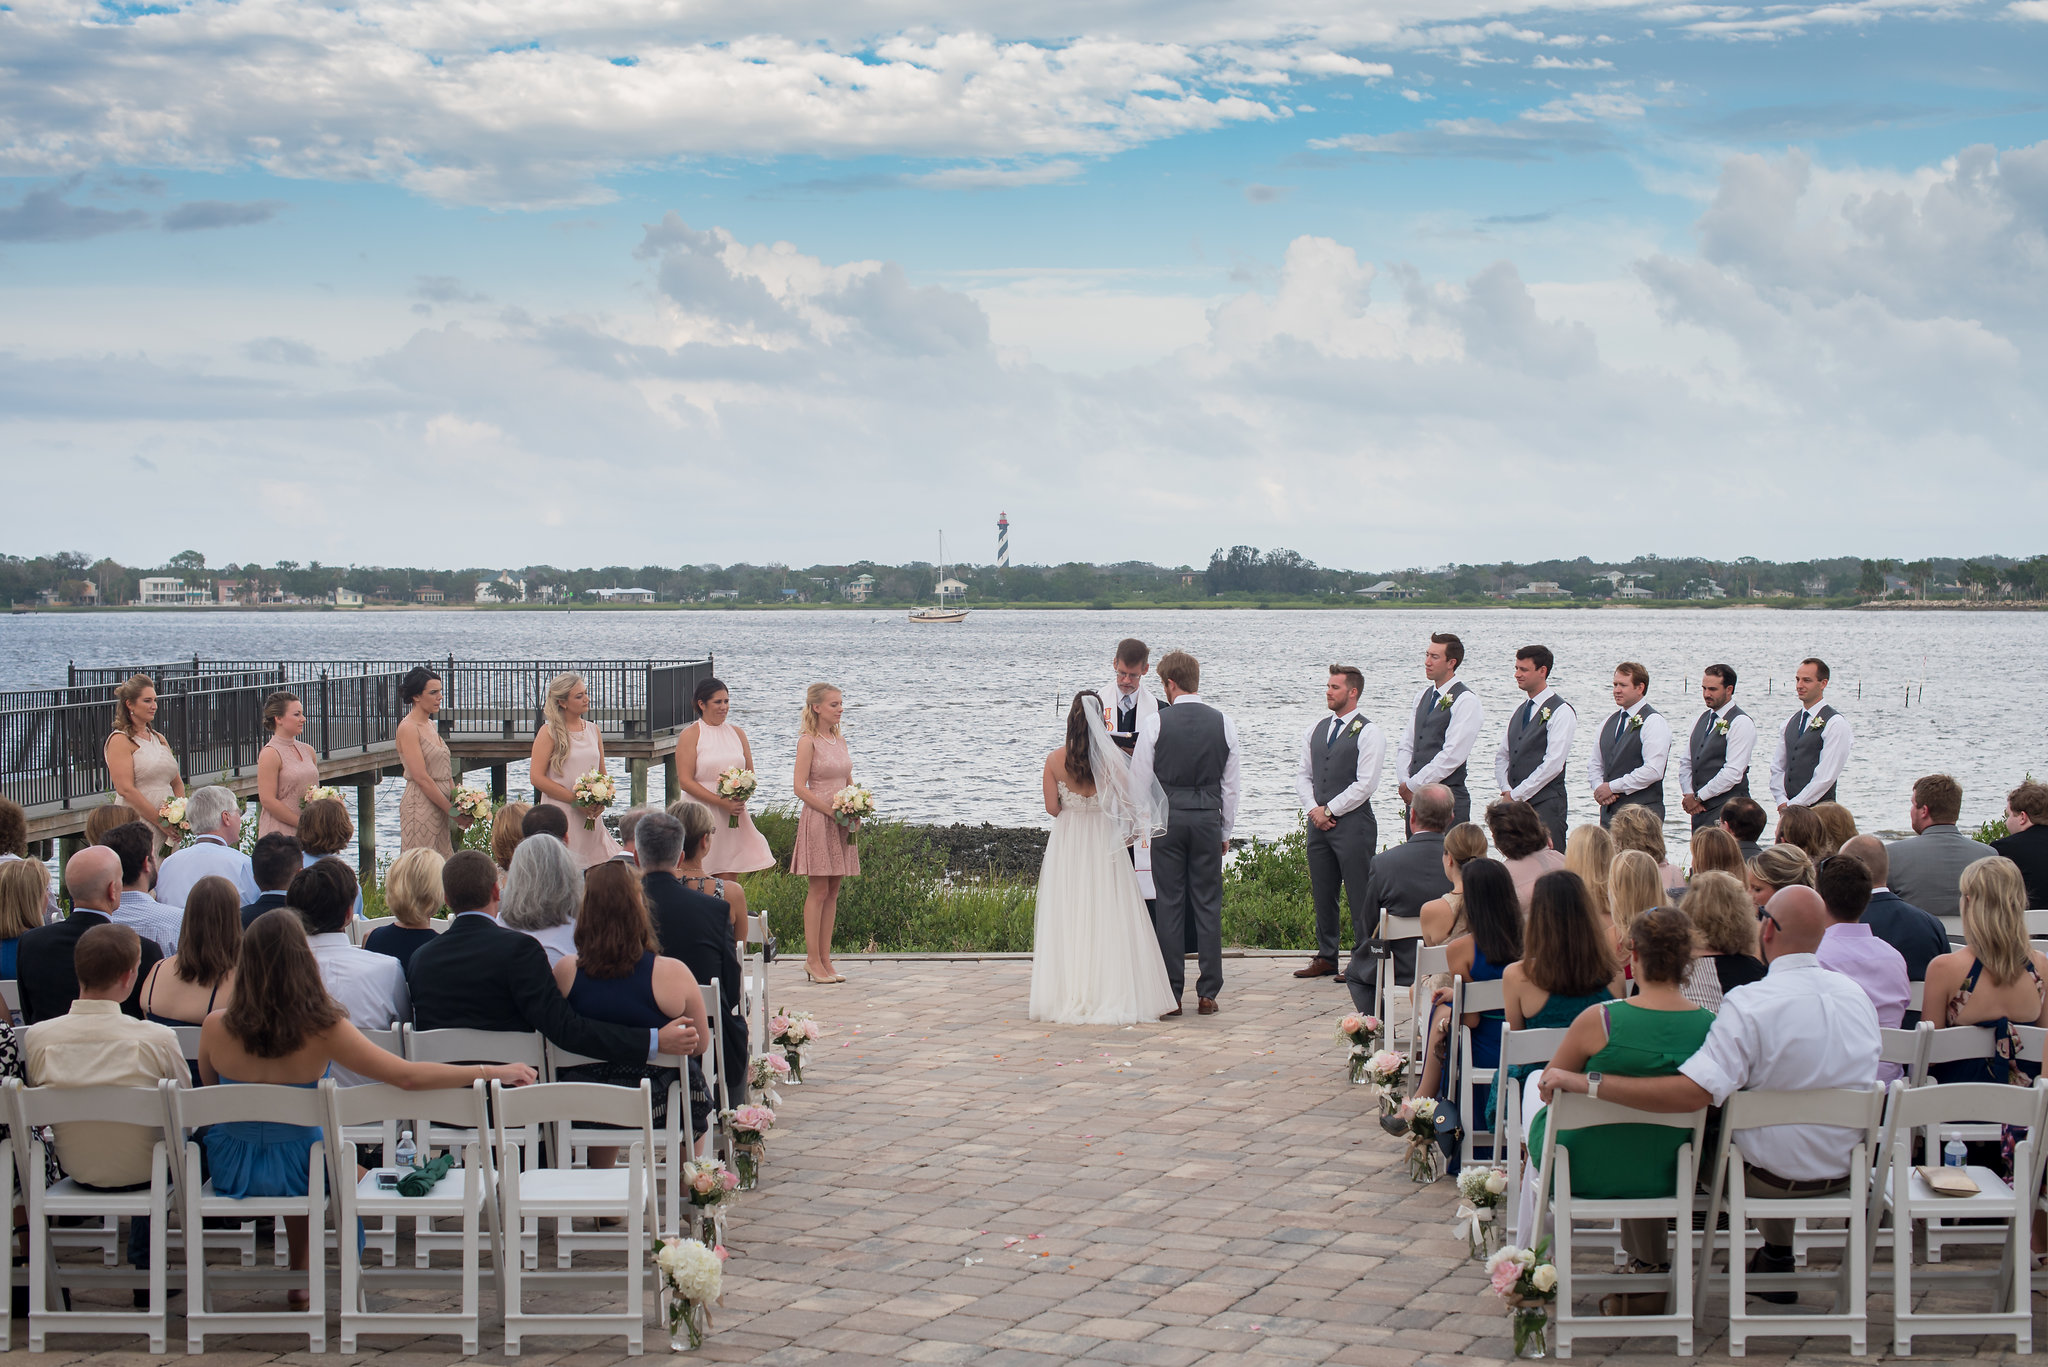 vermont-wedding-photographer-sarah-annay-photography.jpg16.jpg